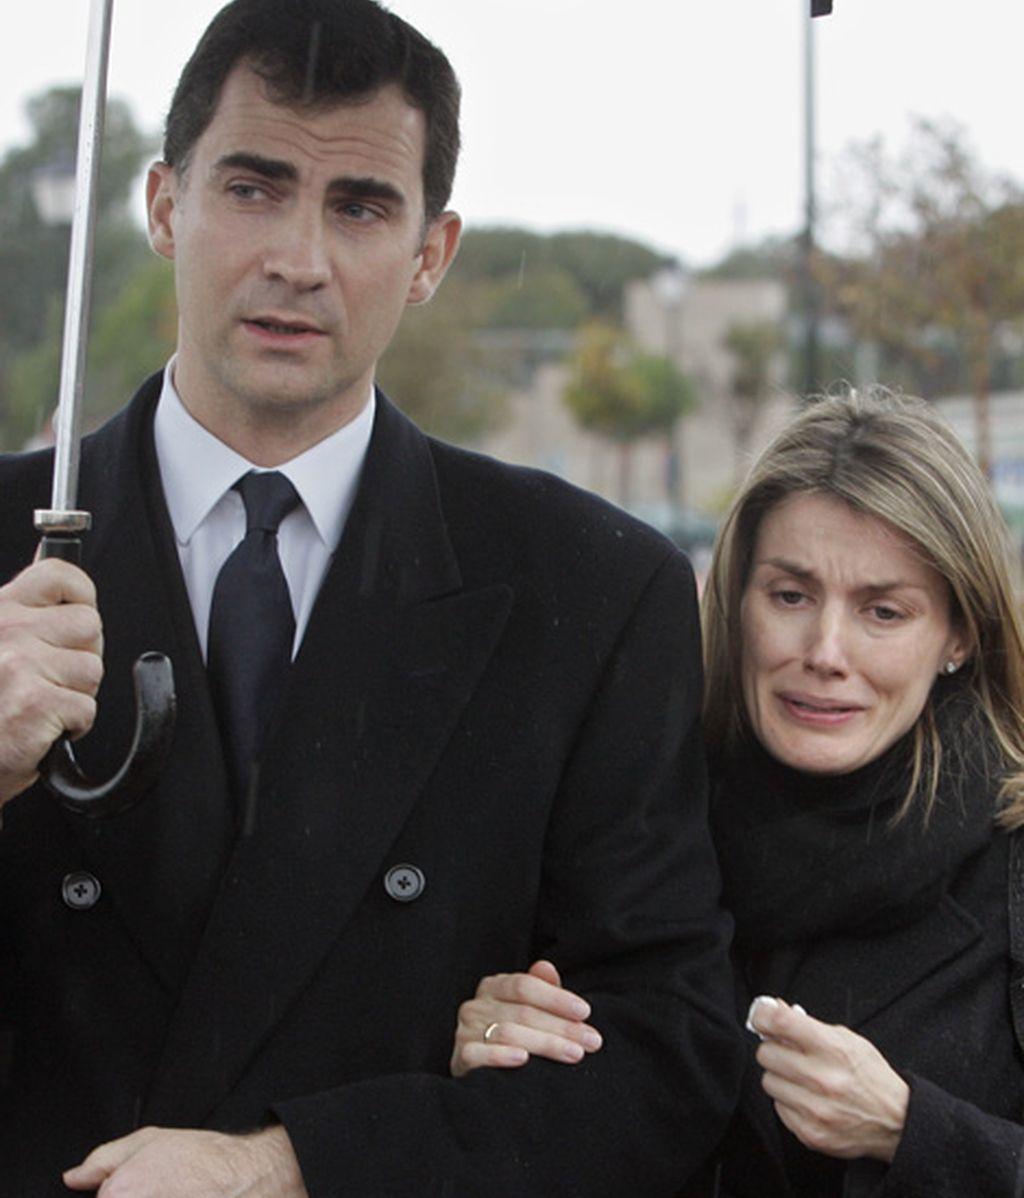 La muerte de Érika Ortiz, hermana de la princesa (febrero de 2007)